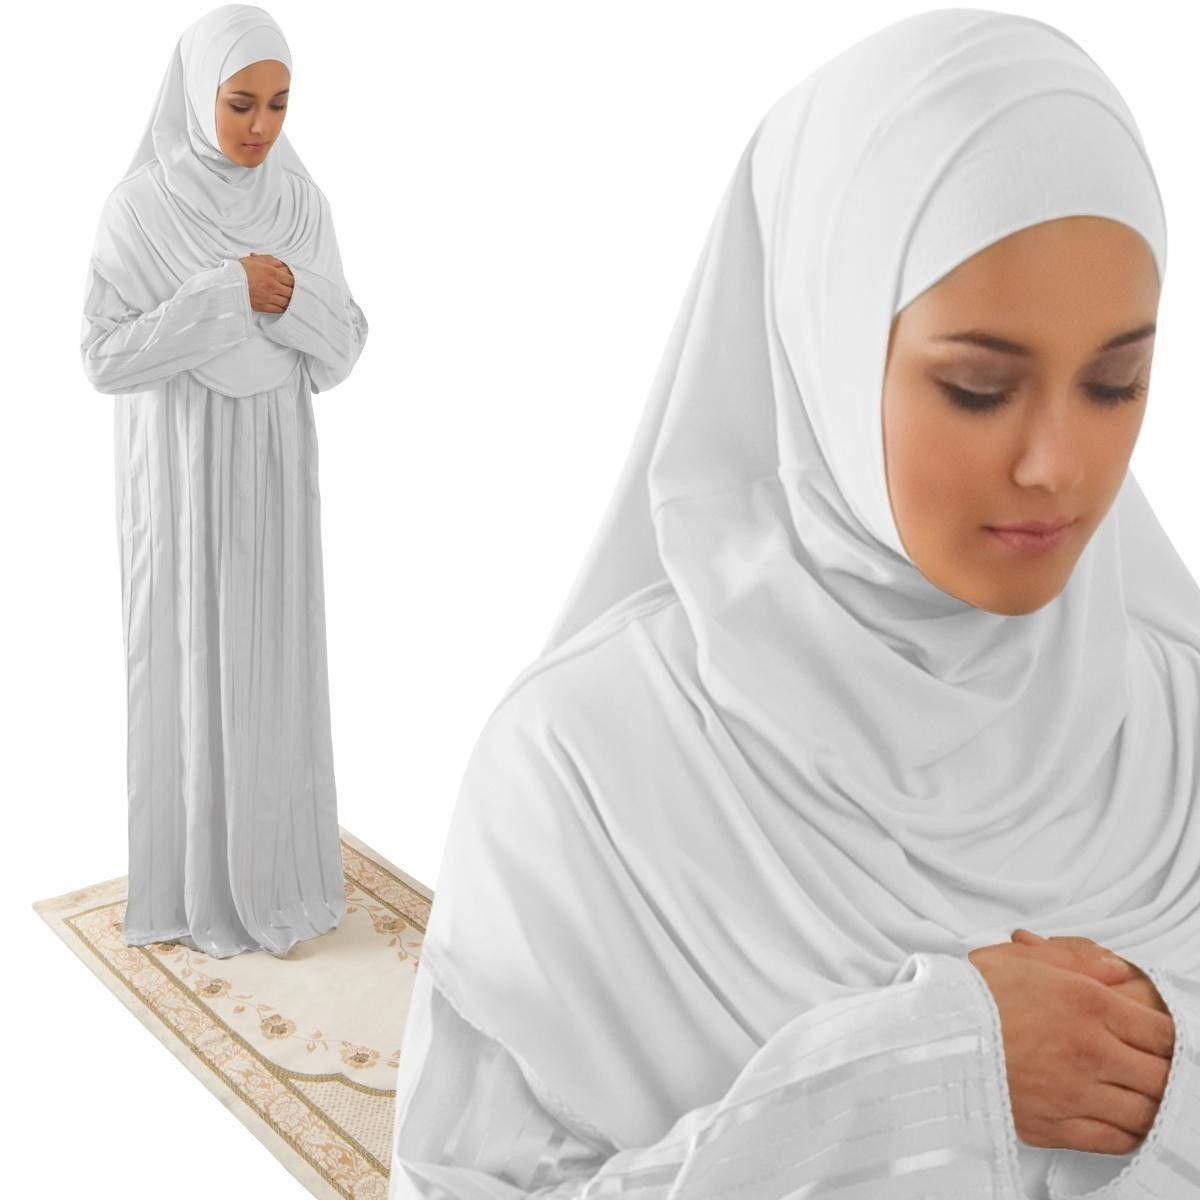 Amade Womens One Piece Prayer Dress White Abaya Gift Set In 2018 Busana Muslim Layla Phasmina